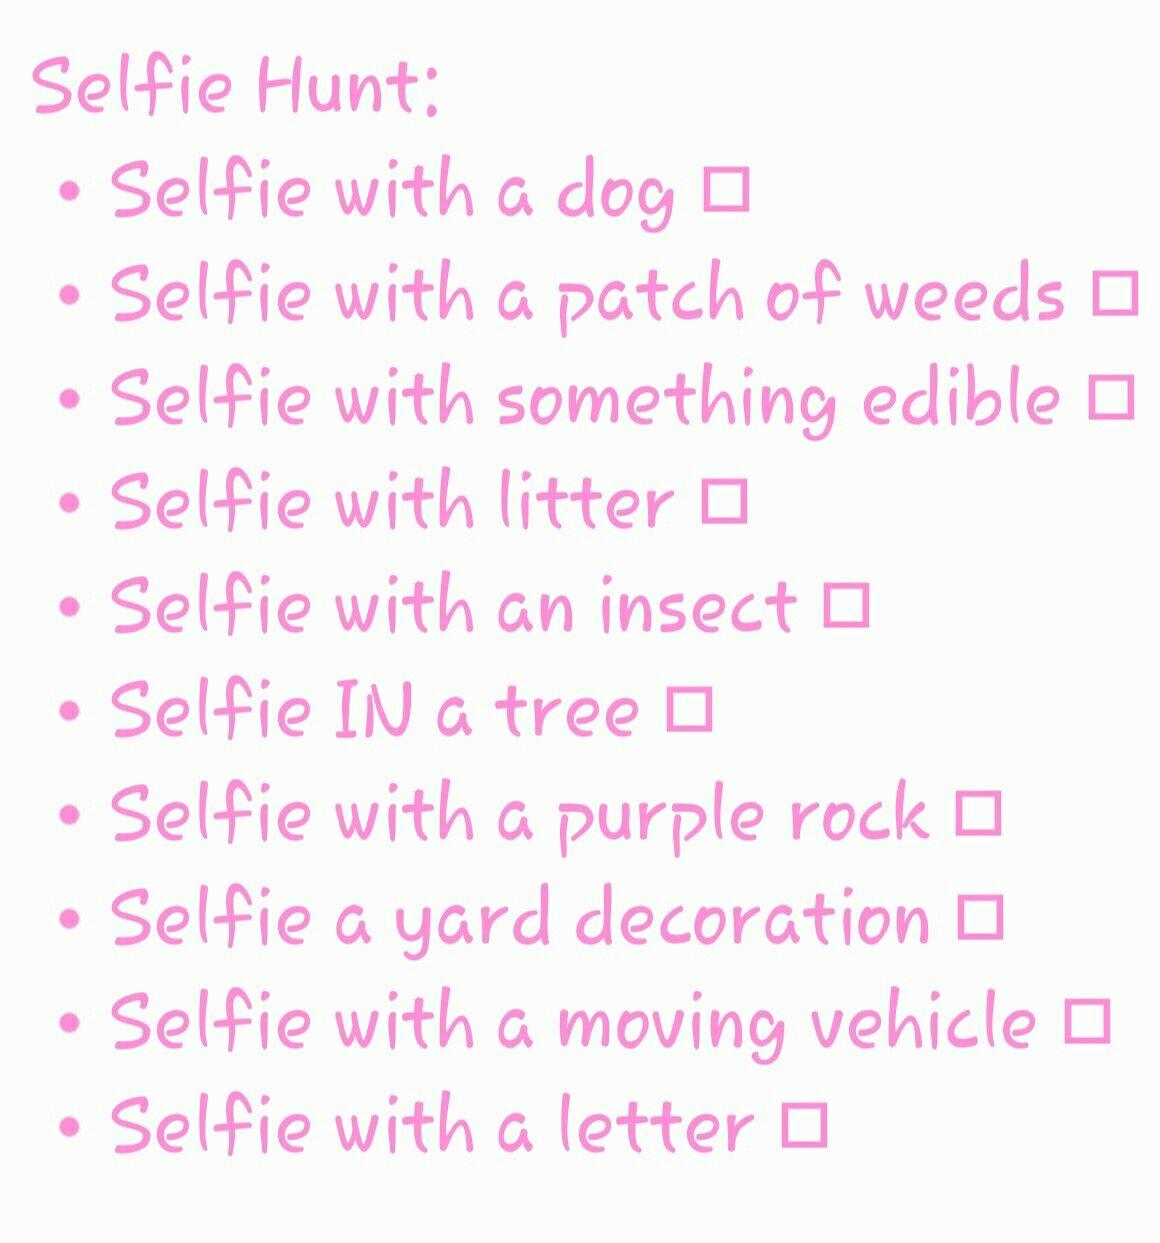 Fun Selfie scavenger hunt for parties! | Mall Scavenger Hunt ...